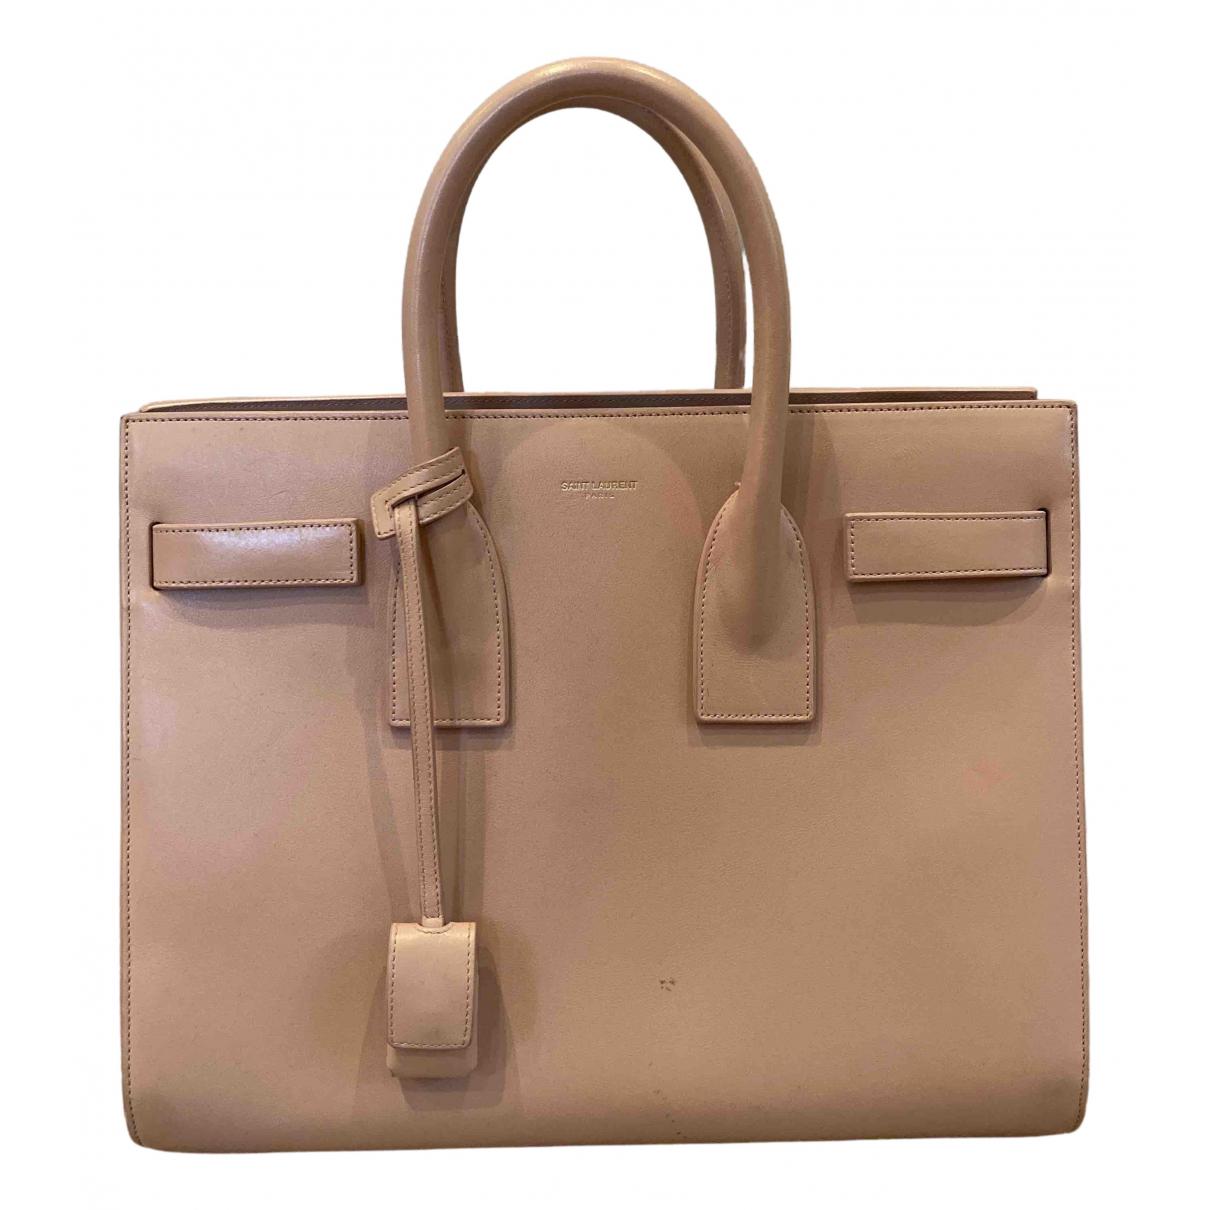 Saint Laurent Sac de Jour Pink Leather handbag for Women N